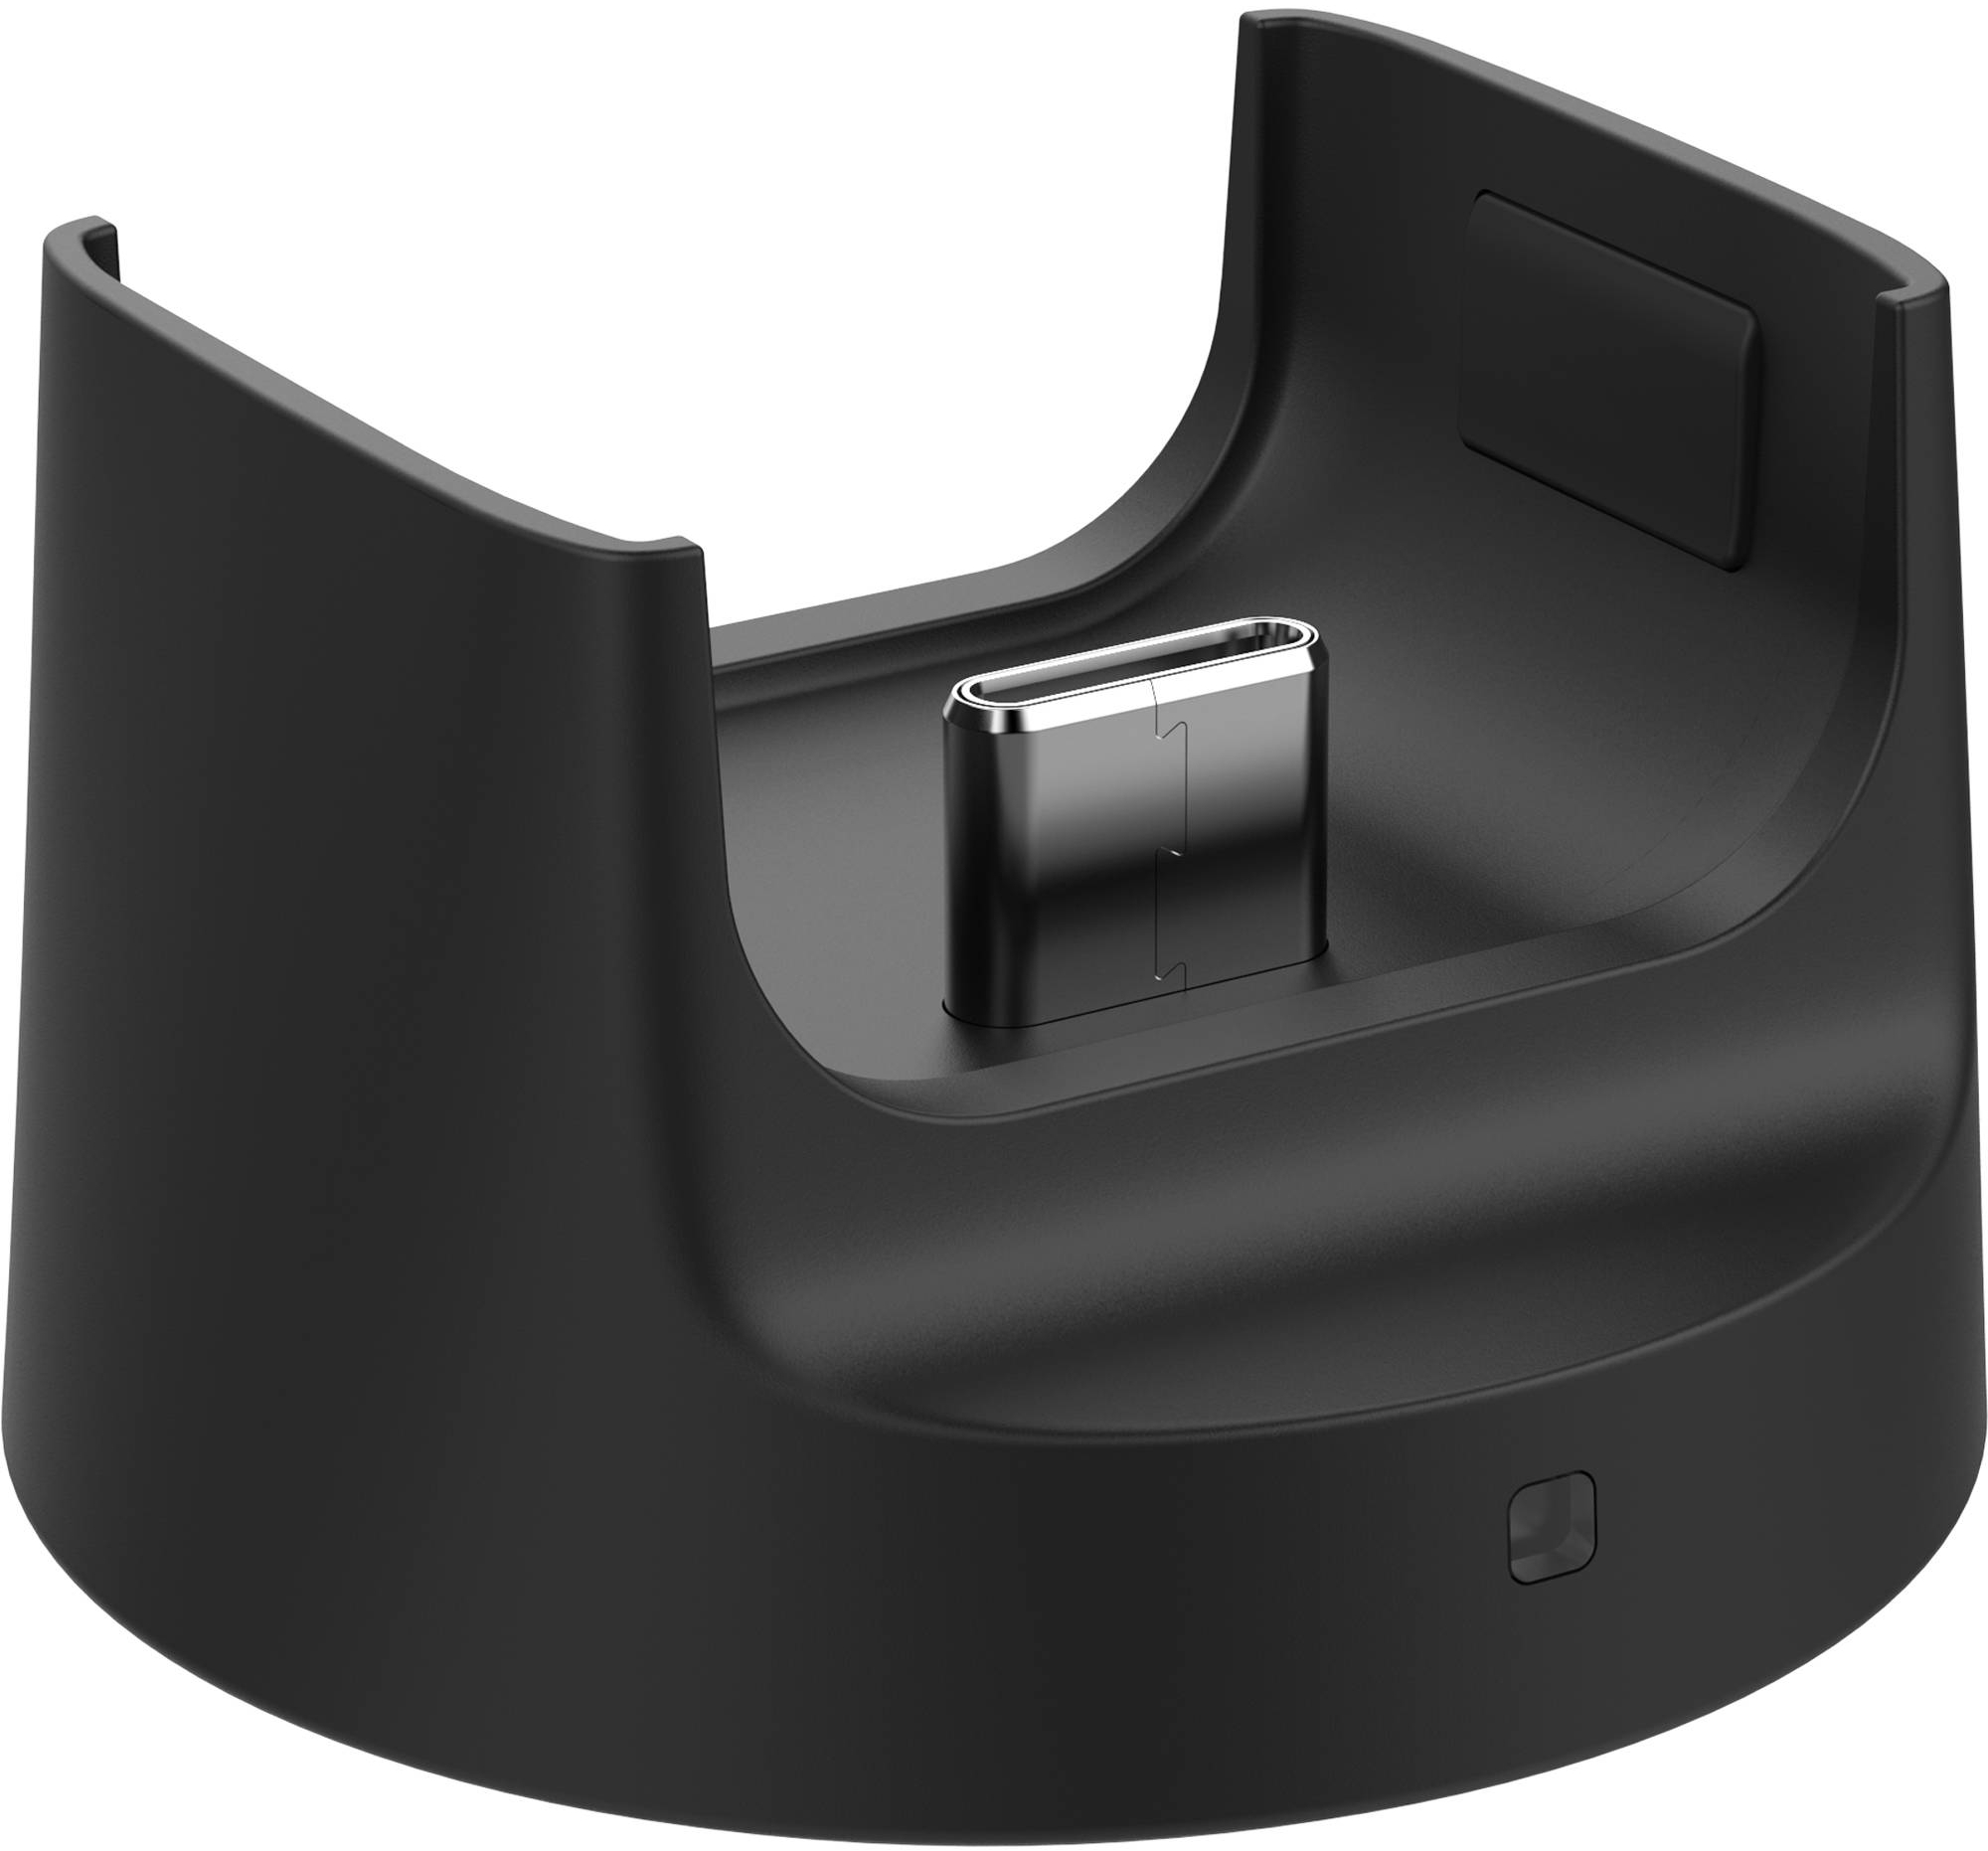 DJI Osmo Pocket - Bezdrátový modul